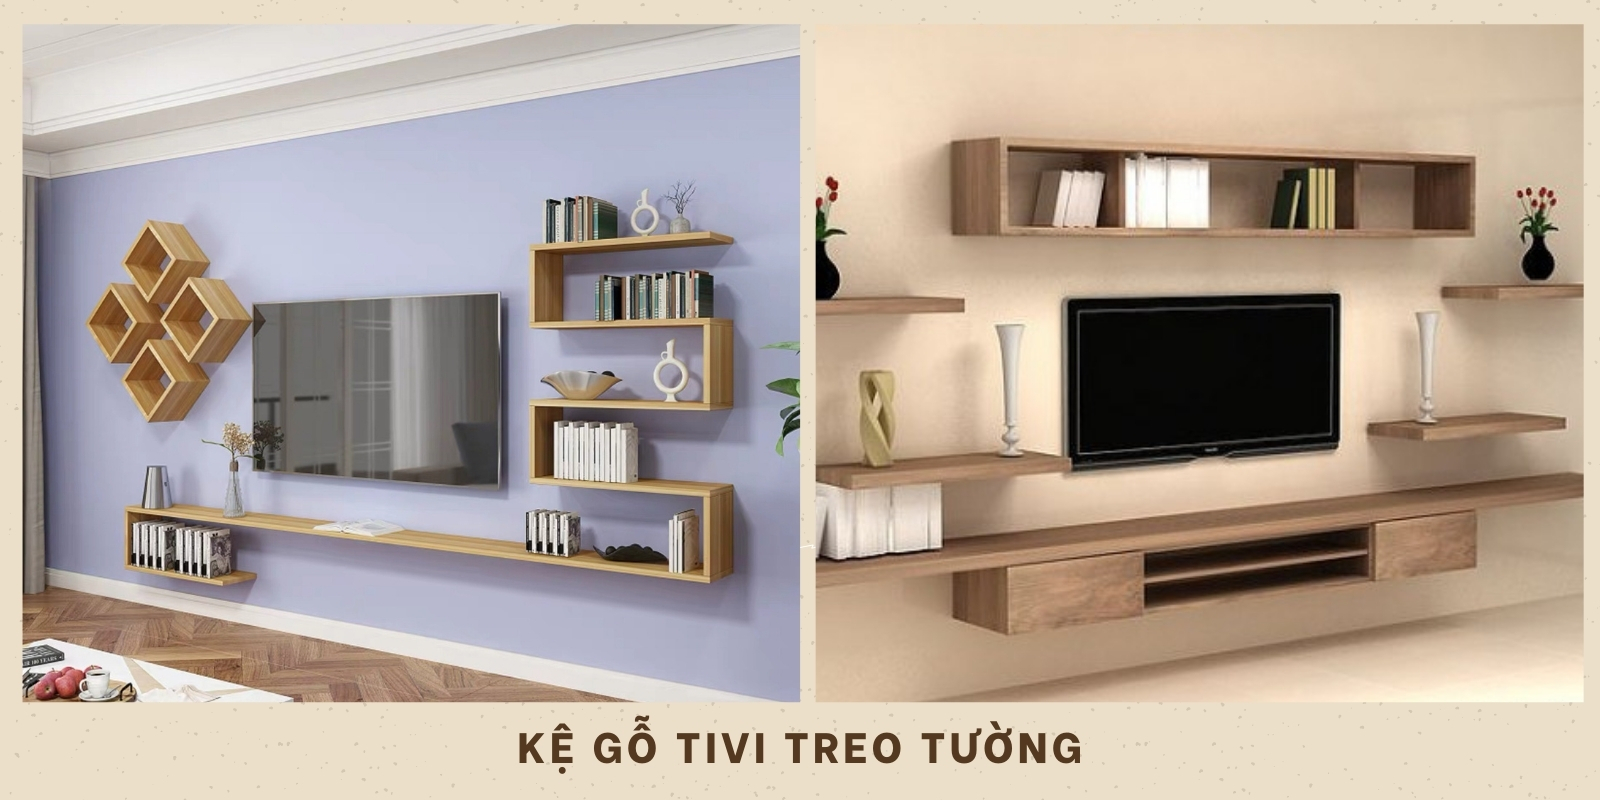 kệ gỗ tivi treo tường